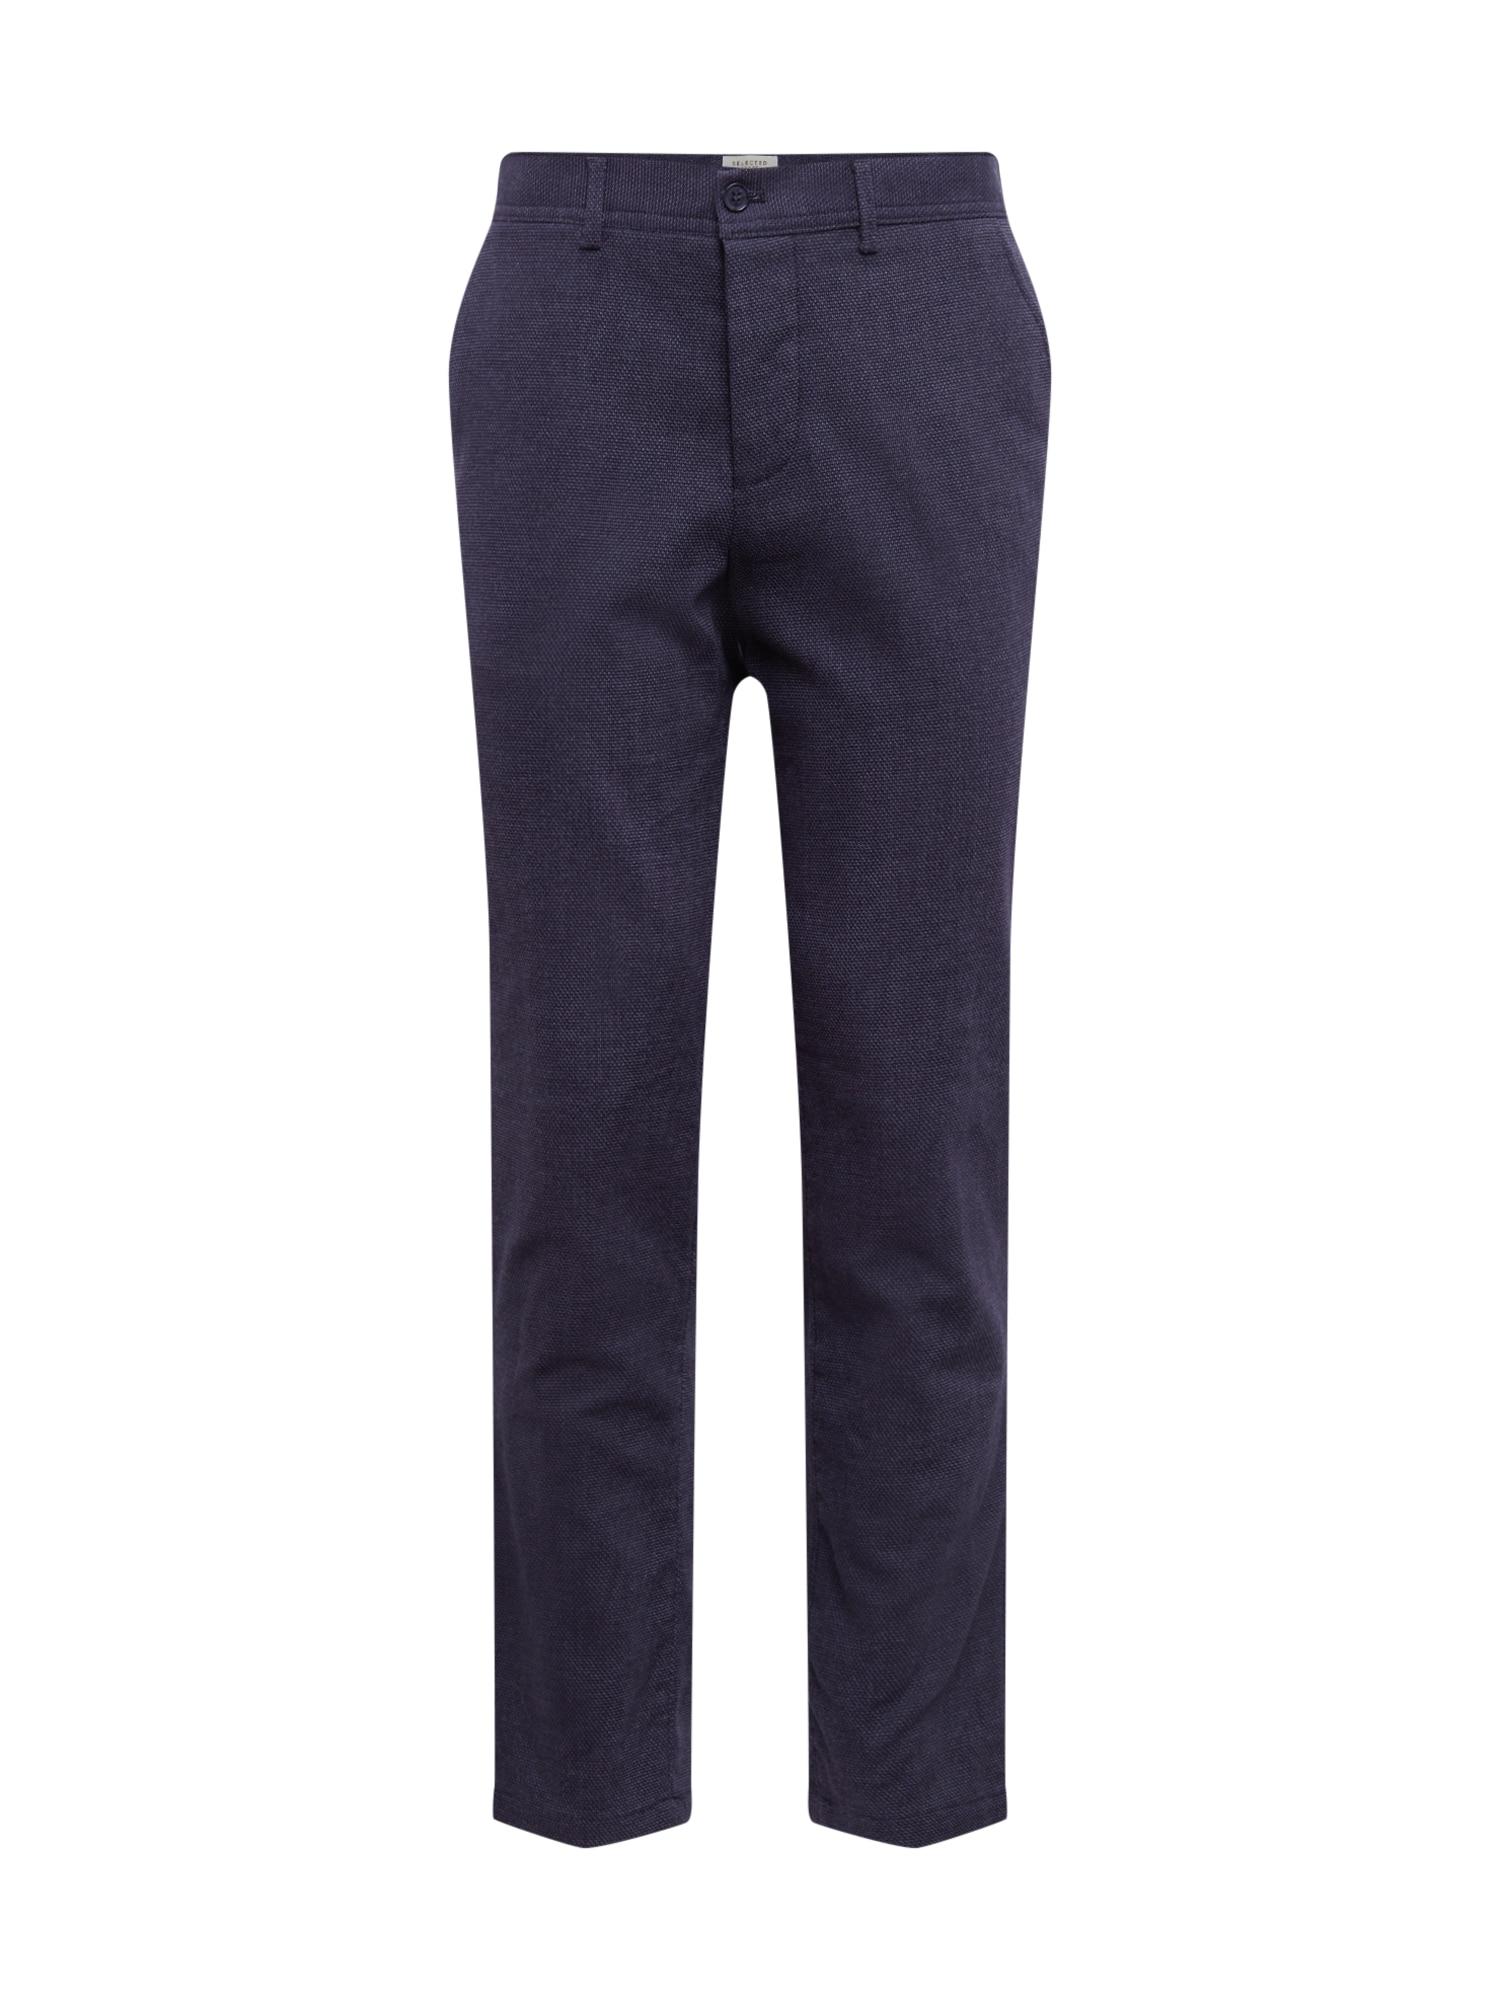 SELECTED HOMME Pantaloni 'FLOYD'  albastru închis